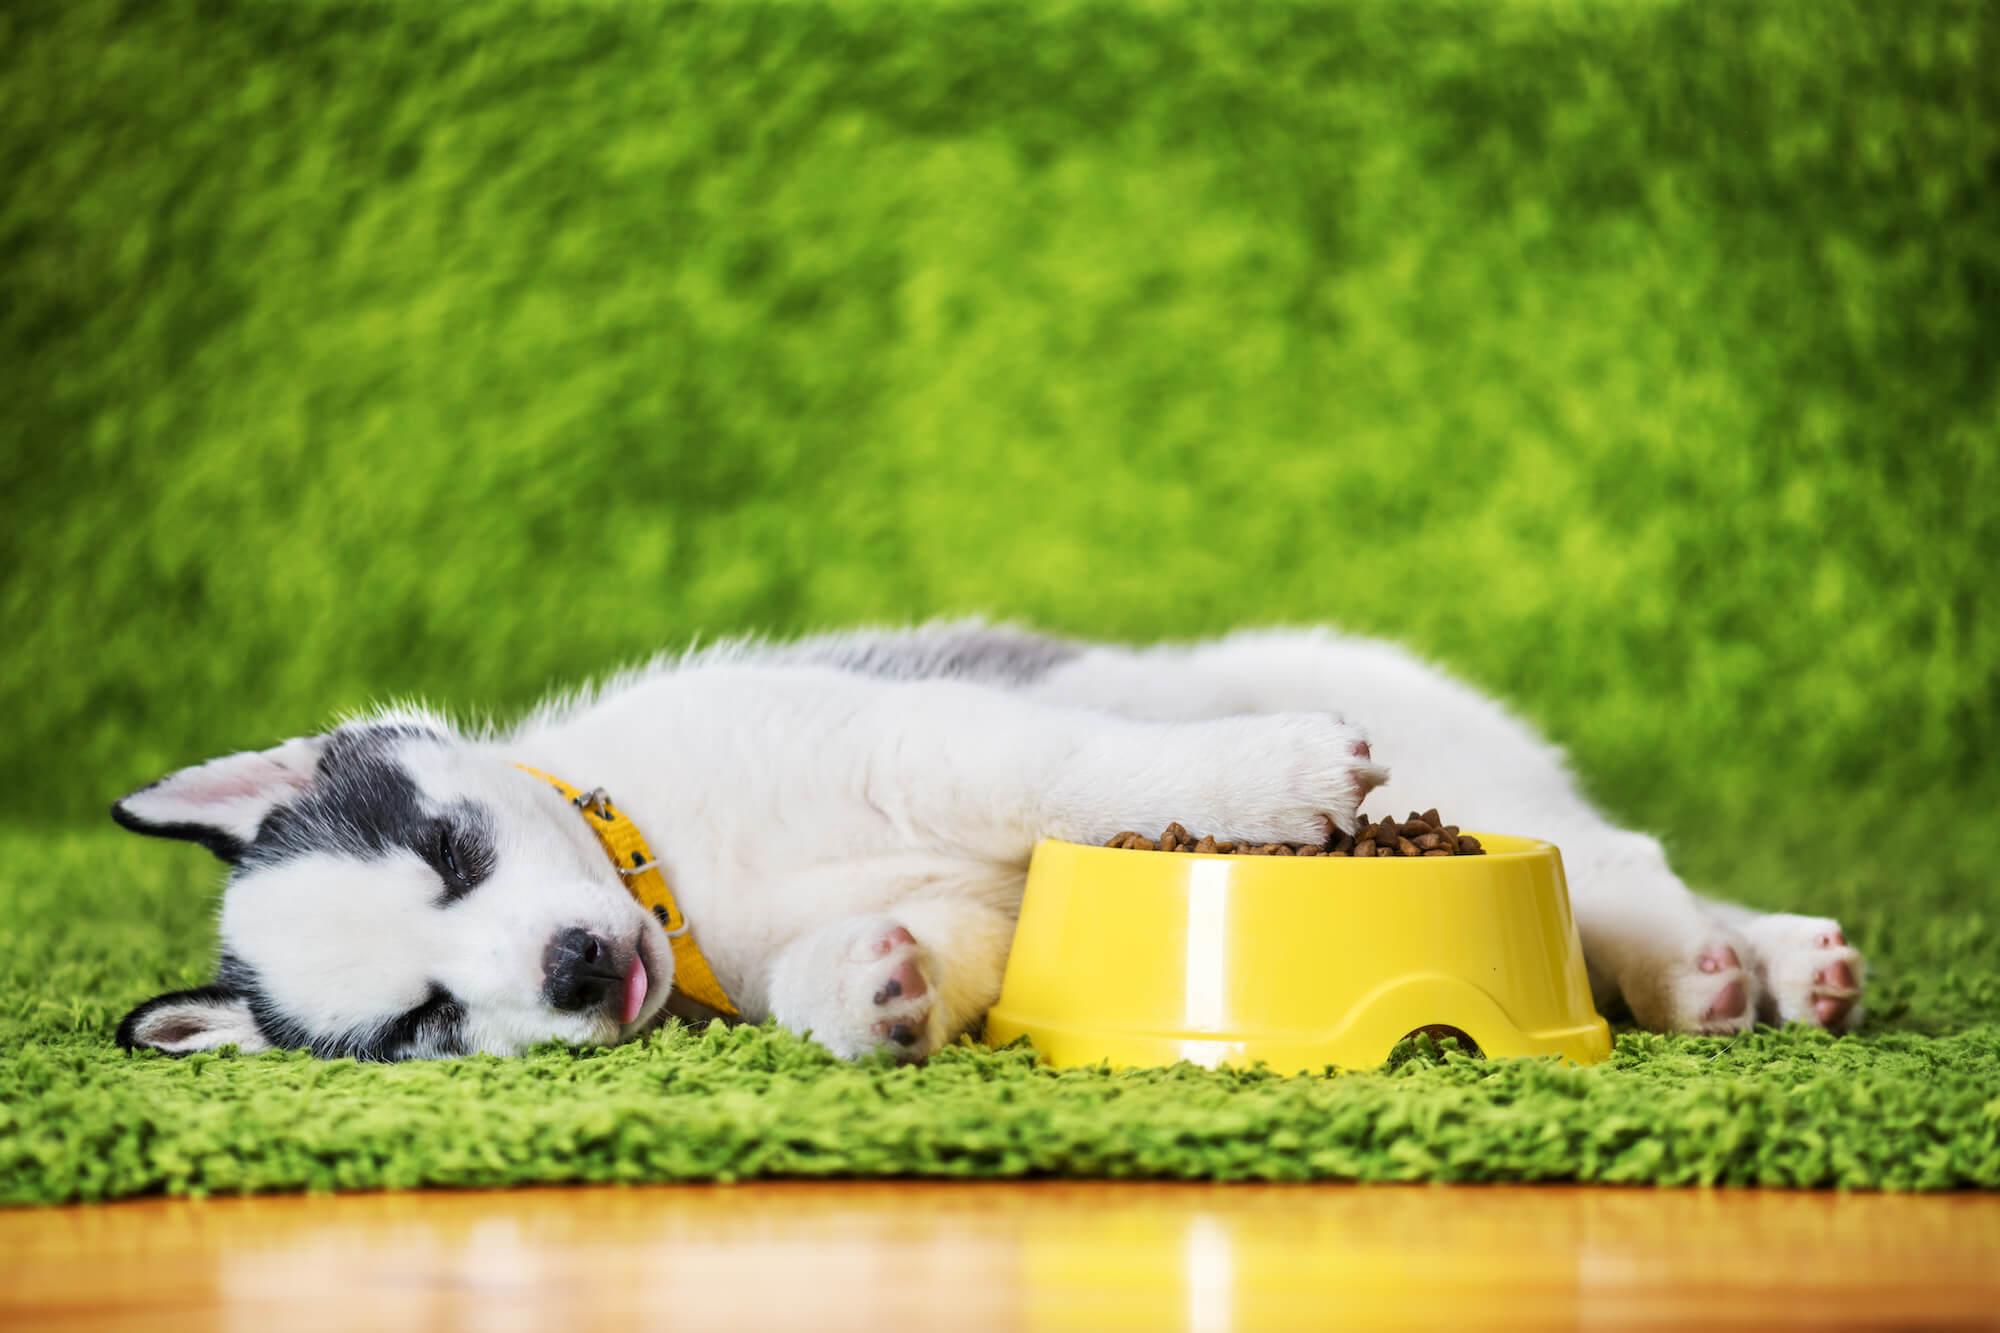 a-small-white-dog-puppy-breed-siberian-husky-YPWGBAT